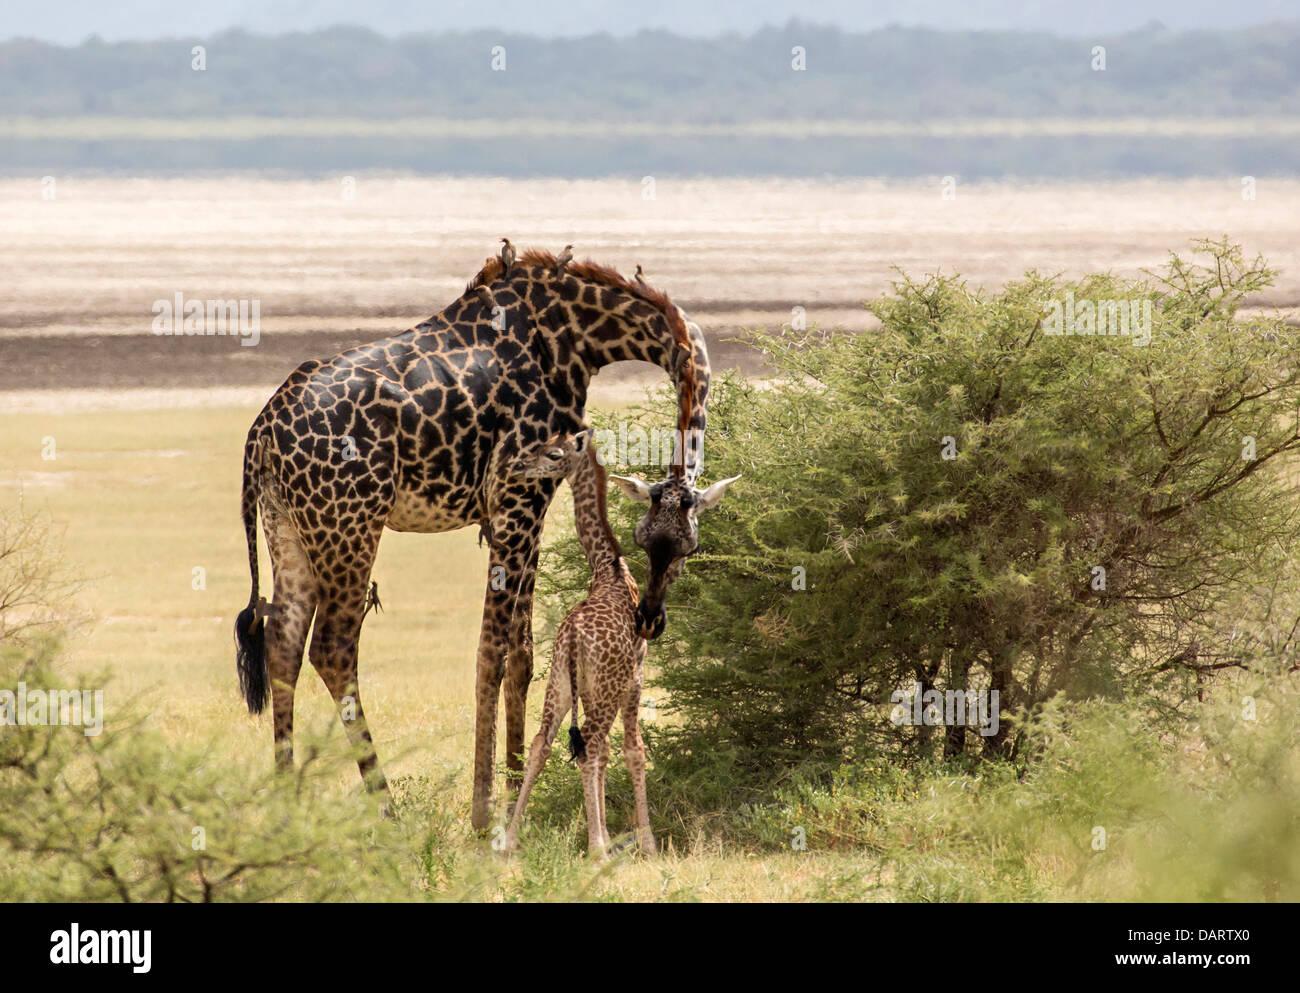 Africa, Tanzania, Lake Manyara National Park. Maasai giraffe (Giraffa camelopardalis tippelskirchi) and calf. - Stock Image